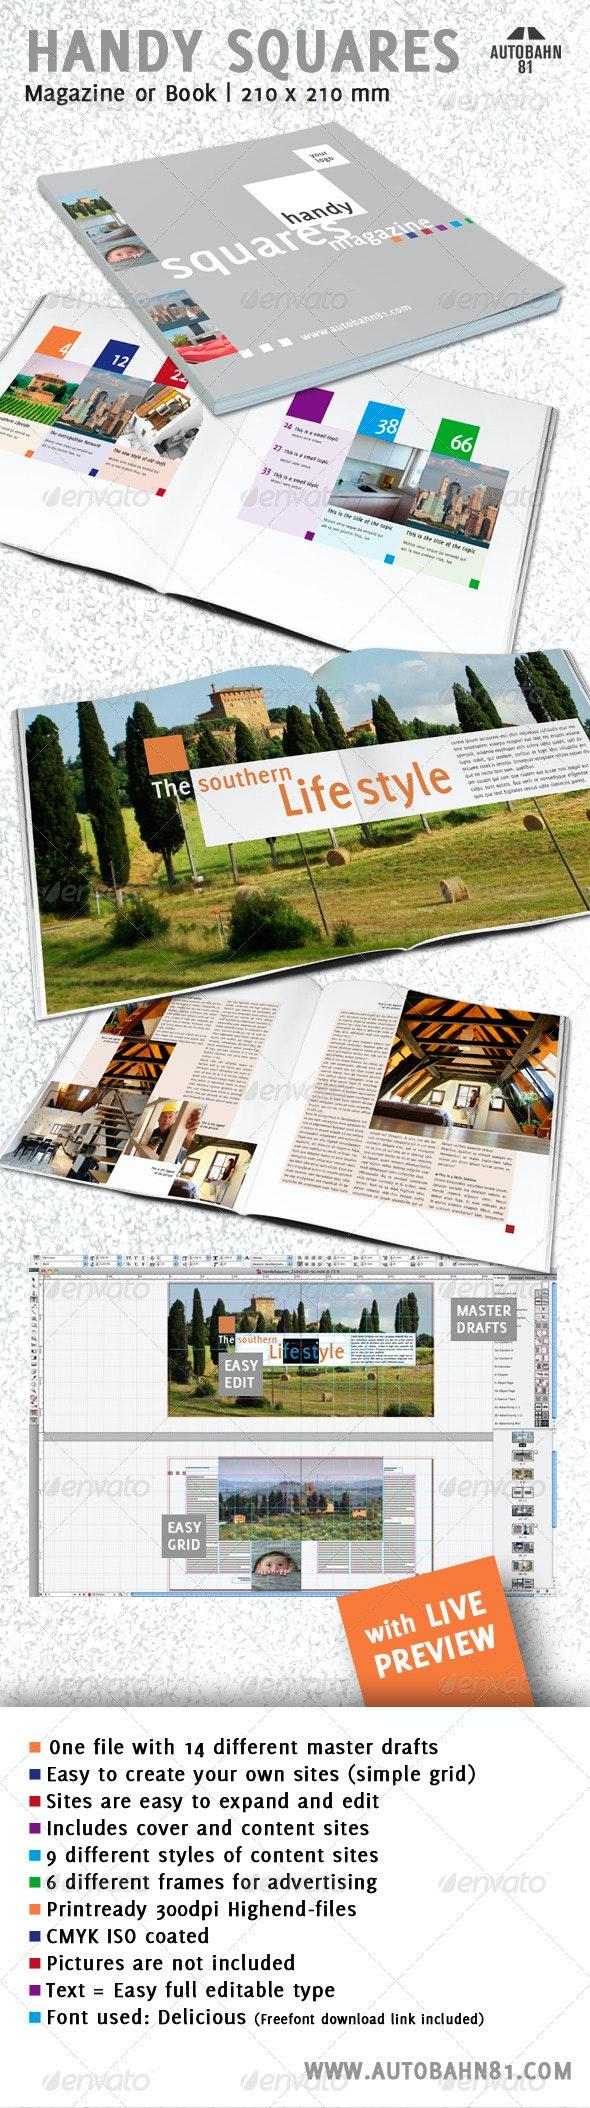 HandySquares Magazine - Magazines Print Templates